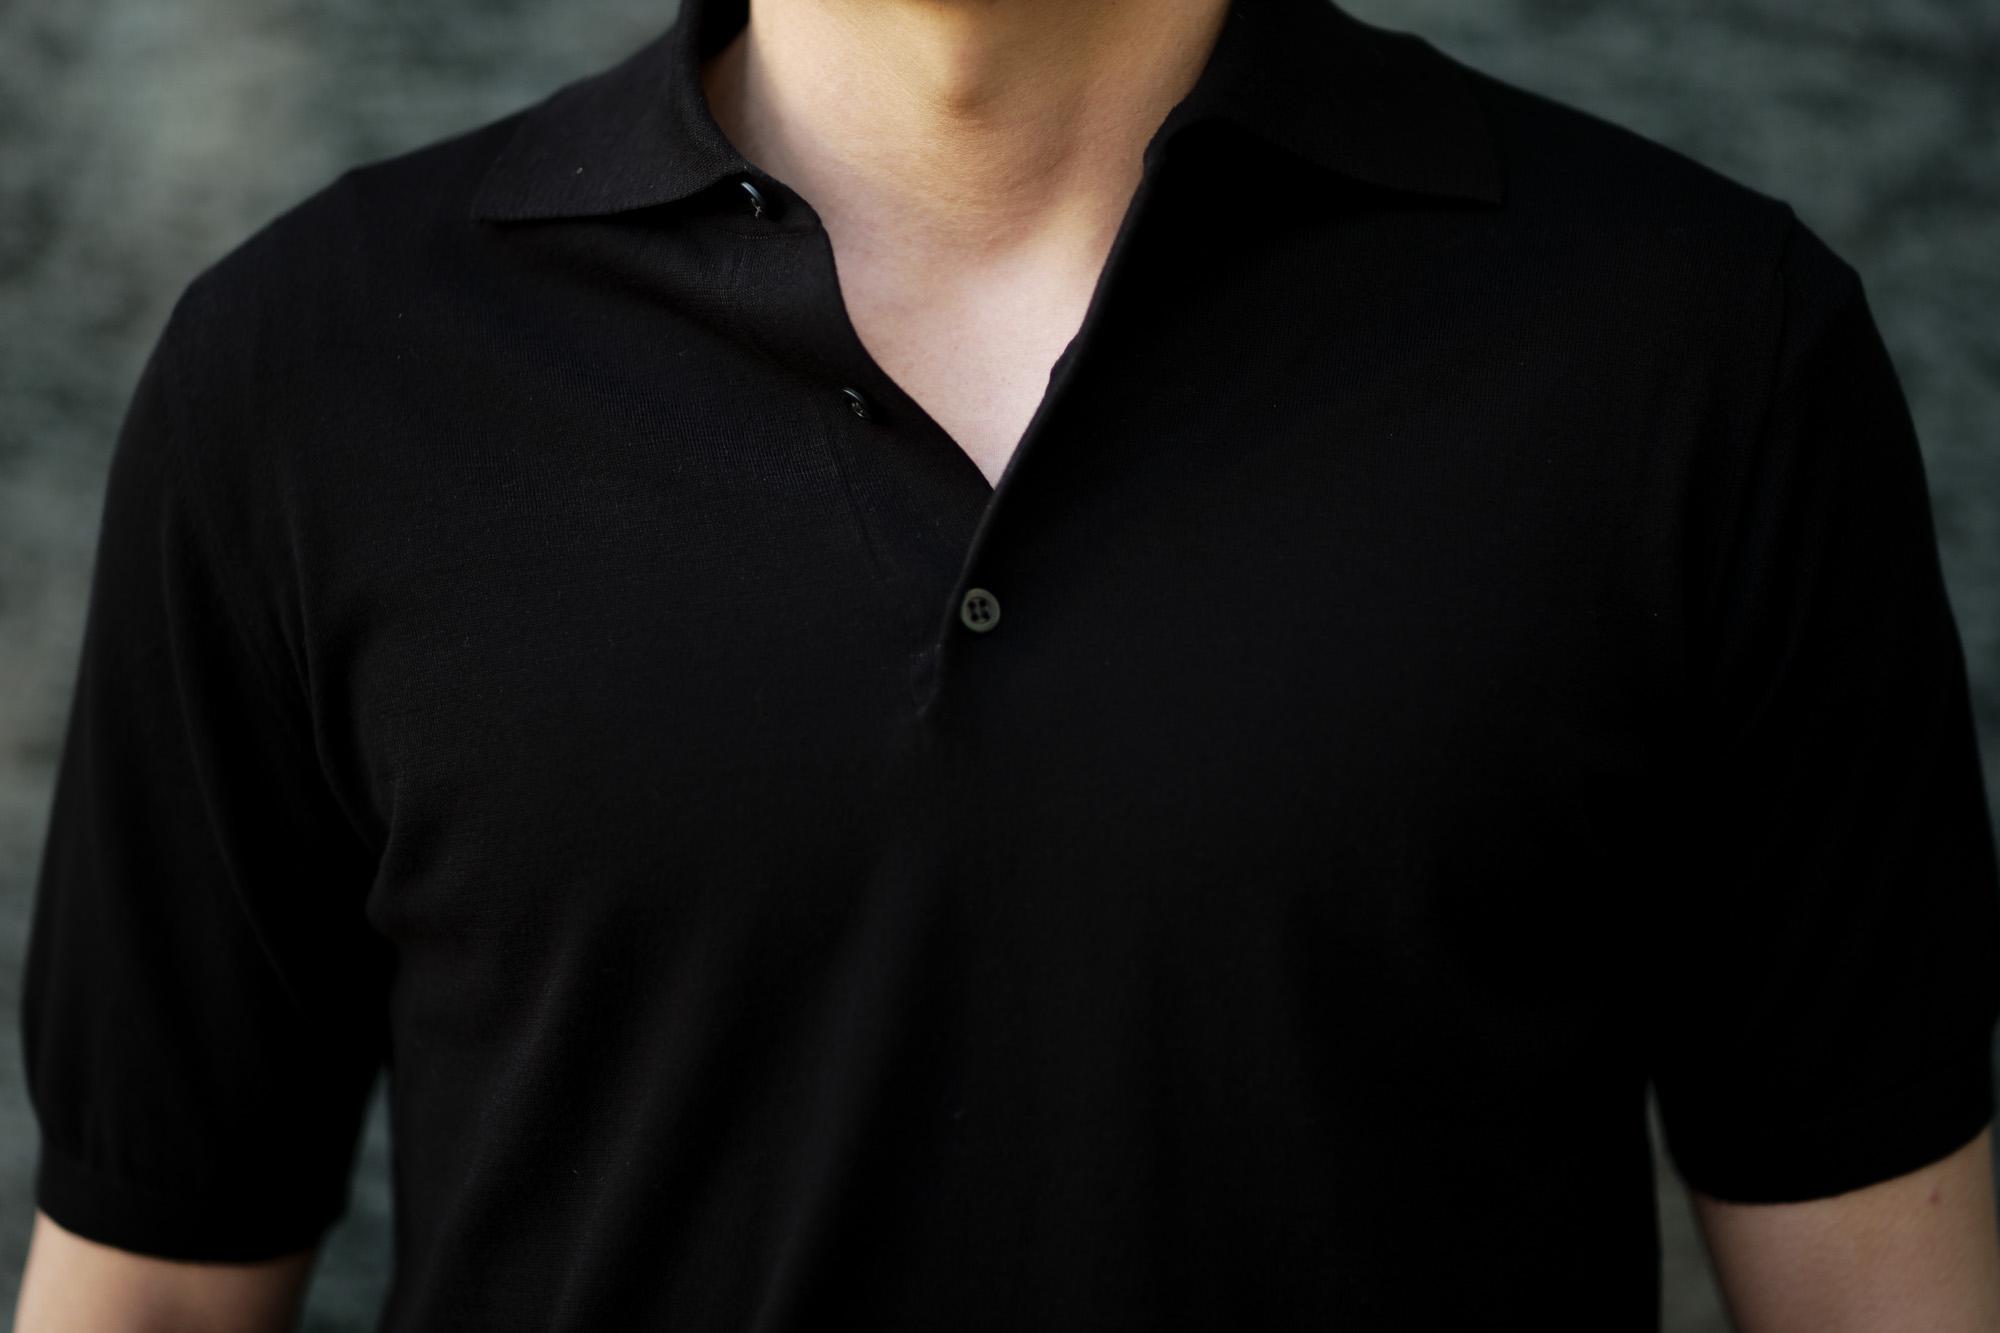 Cruciani(クルチアーニ) 33G Knit Polo Shirt 33ゲージ コットン ニット ポロシャツ BLACK (ブラック・Z0048) made in italy (イタリア製) 2020 春夏新作 愛知 名古屋 altoediritto アルトエデリット